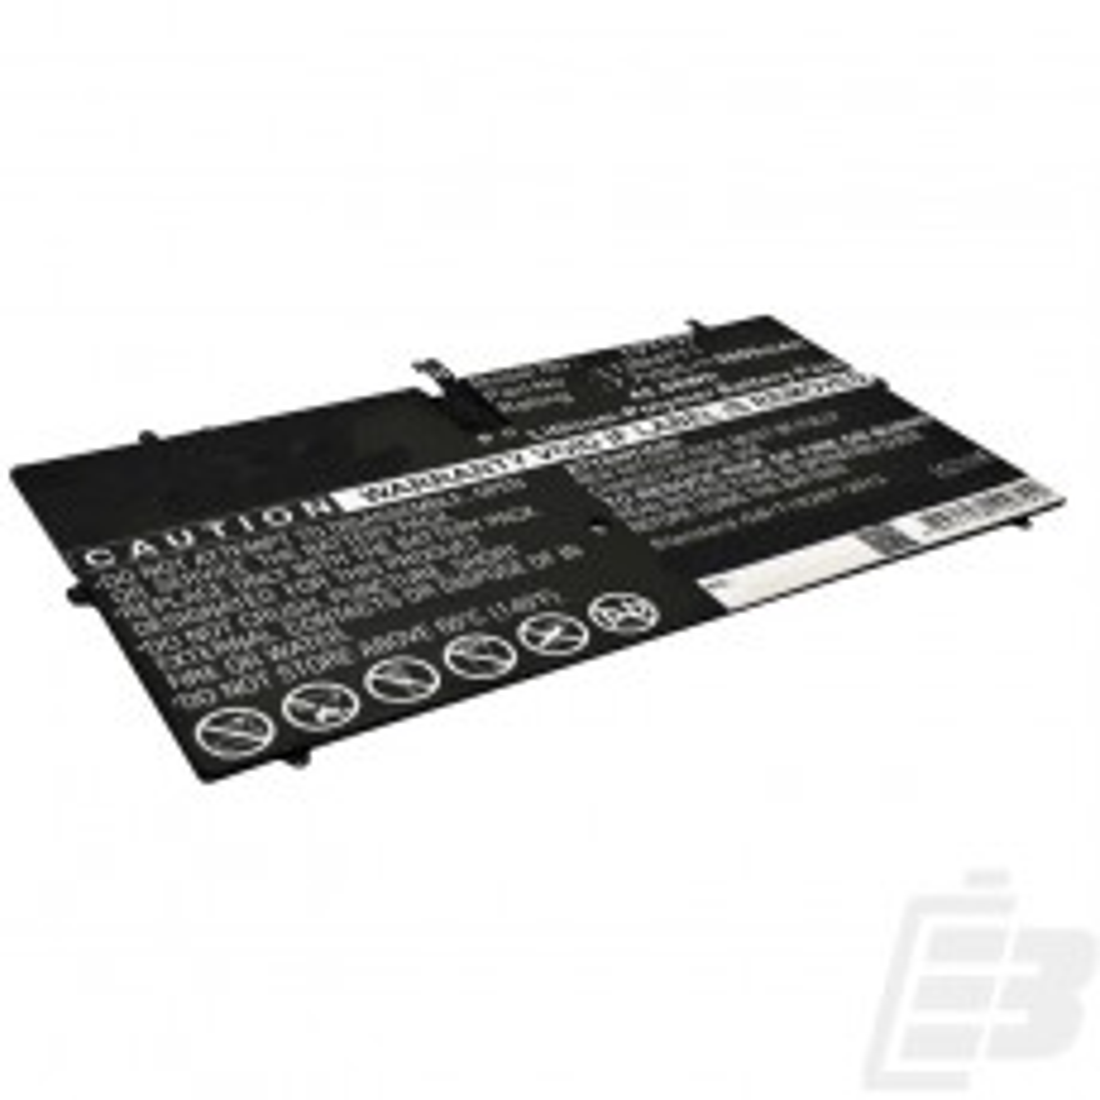 Laptop battery Lenovo Yoga 3 Pro_1